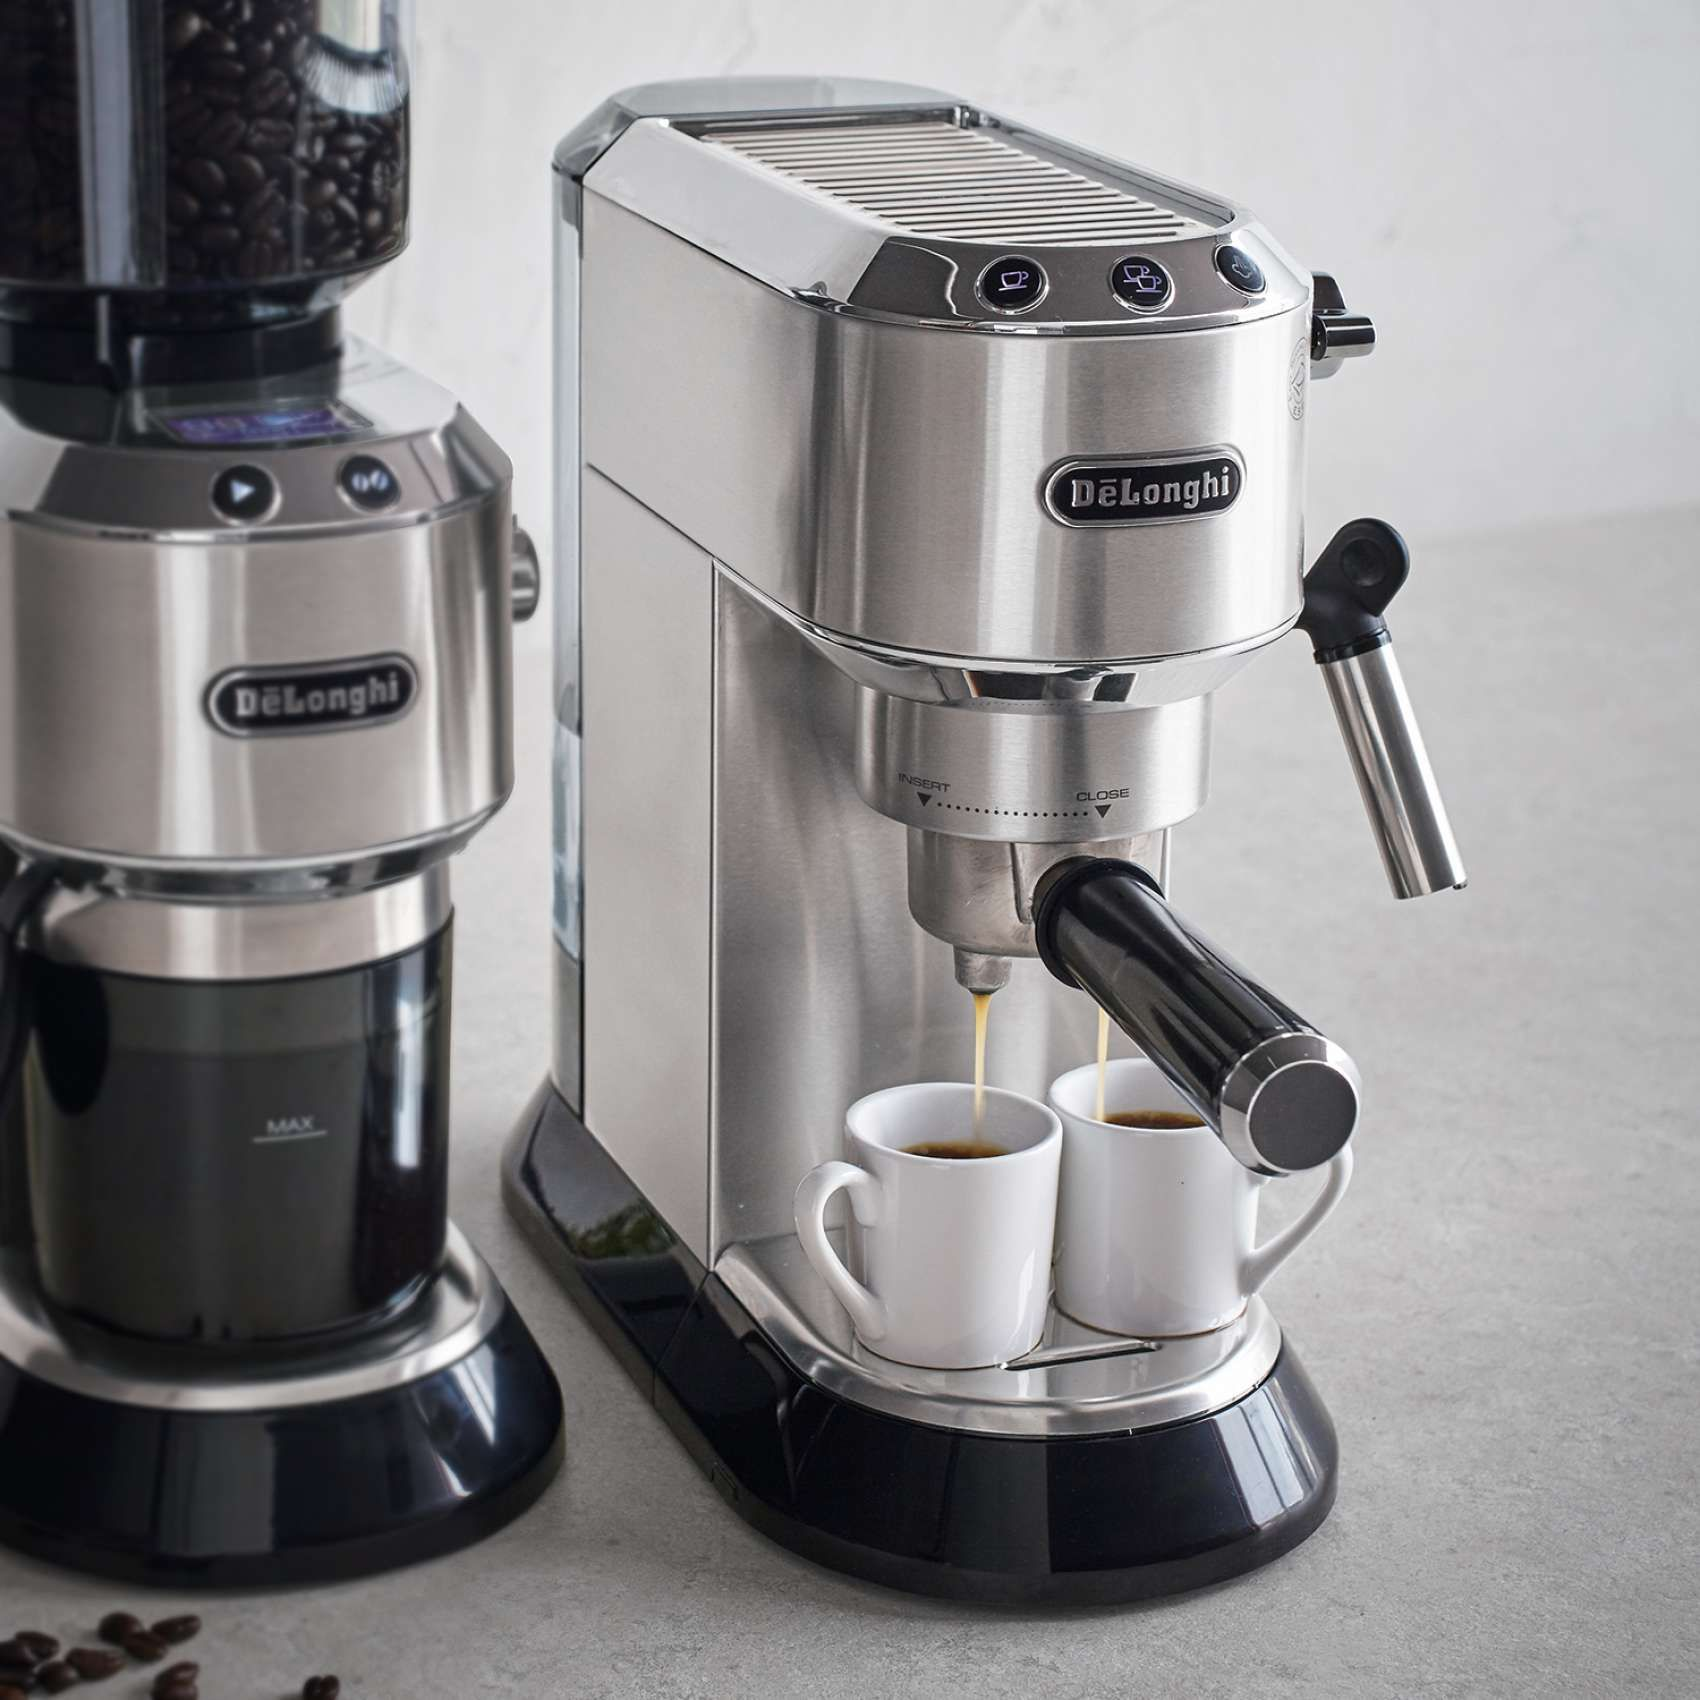 De Longhi Dedica Pump Espresso Machine Sur La Table Espresso Machine Espresso Coffee Machine Cappuccino Machine